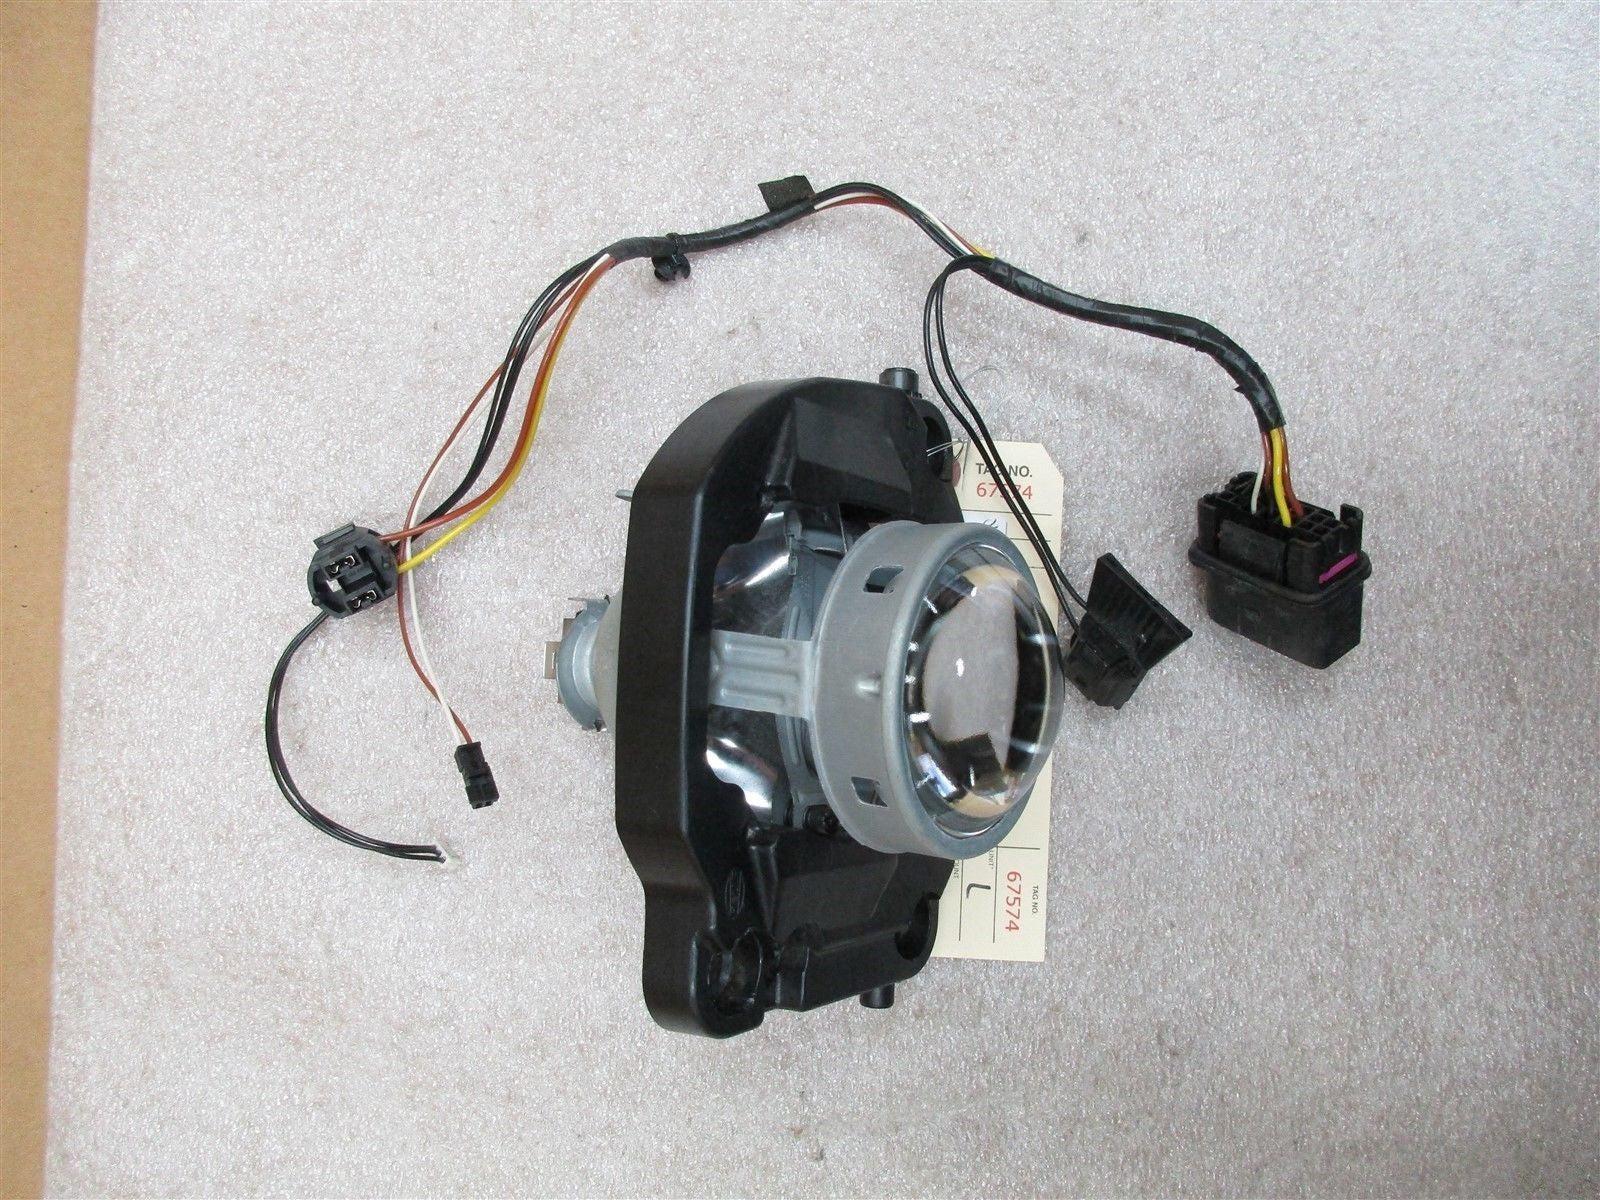 hight resolution of 08 cayenne s awd porsche 957 l headlight hardware wiring harness 122 873